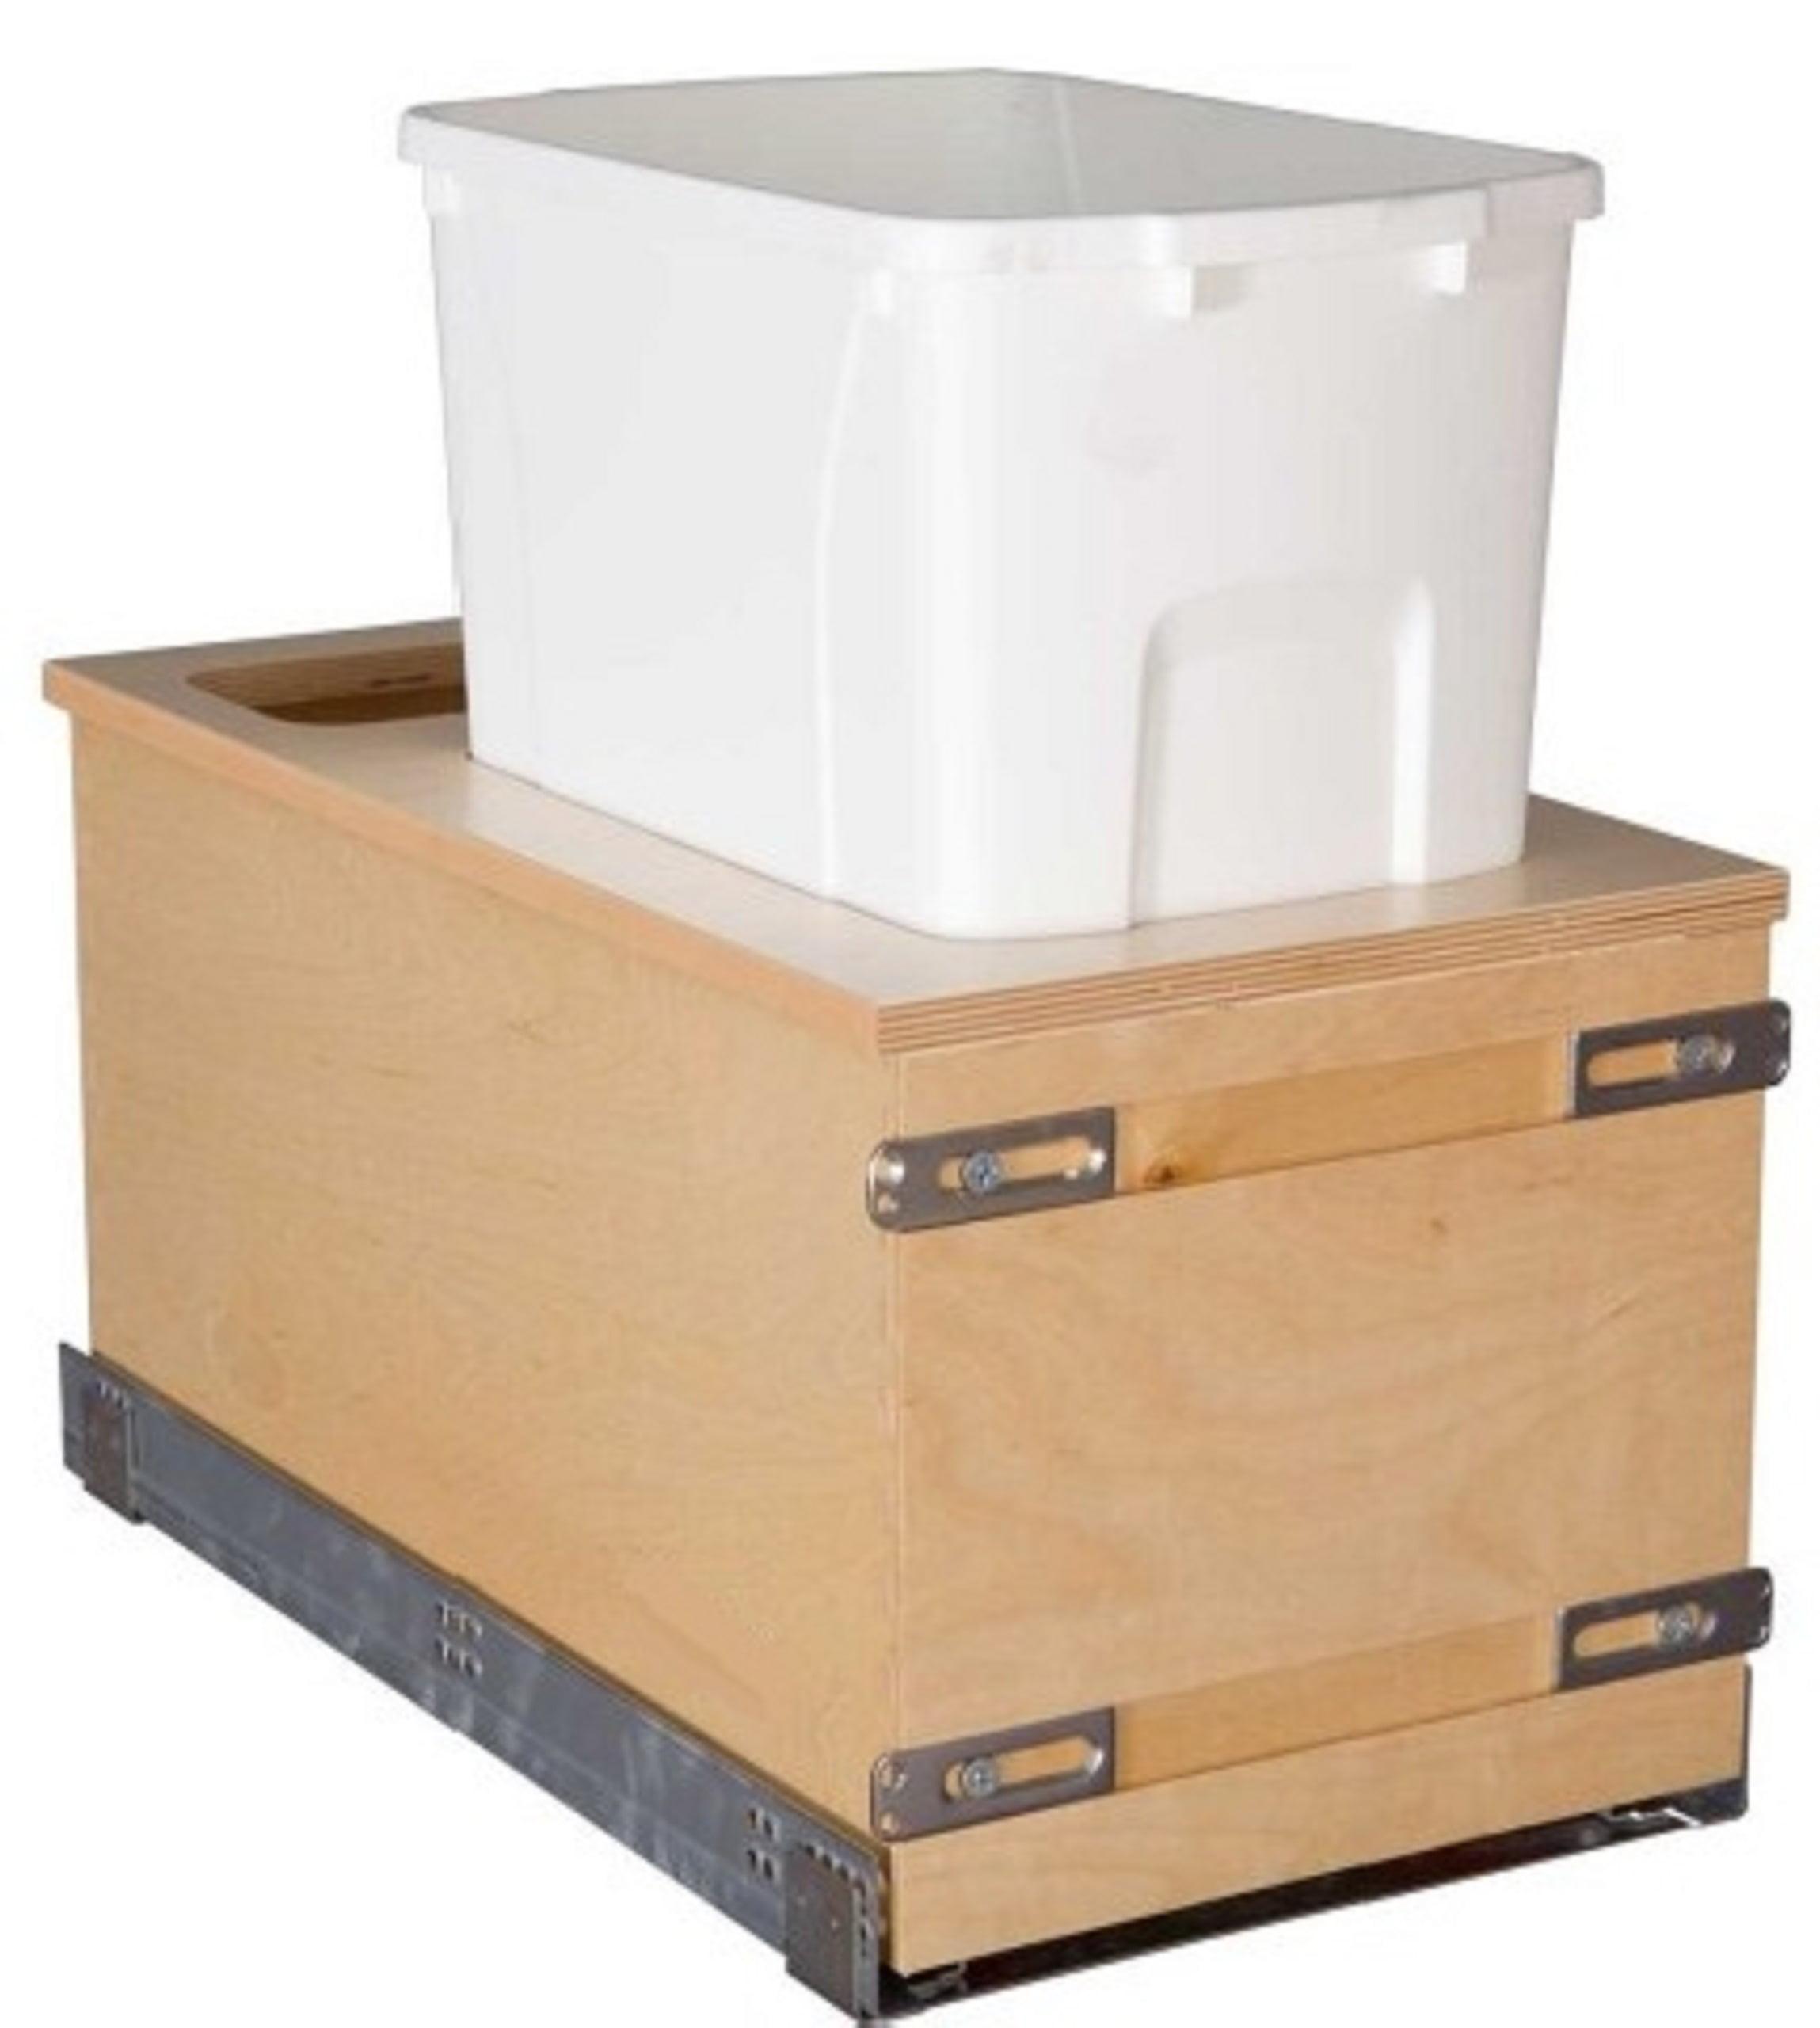 "Century Components Edge Series EDGBM11PF Kitchen Pull Out Waste Bin - 34 Qt Single White Plastic Container - Baltic Birch - Undermount Slide, 11-7/8"" wide"